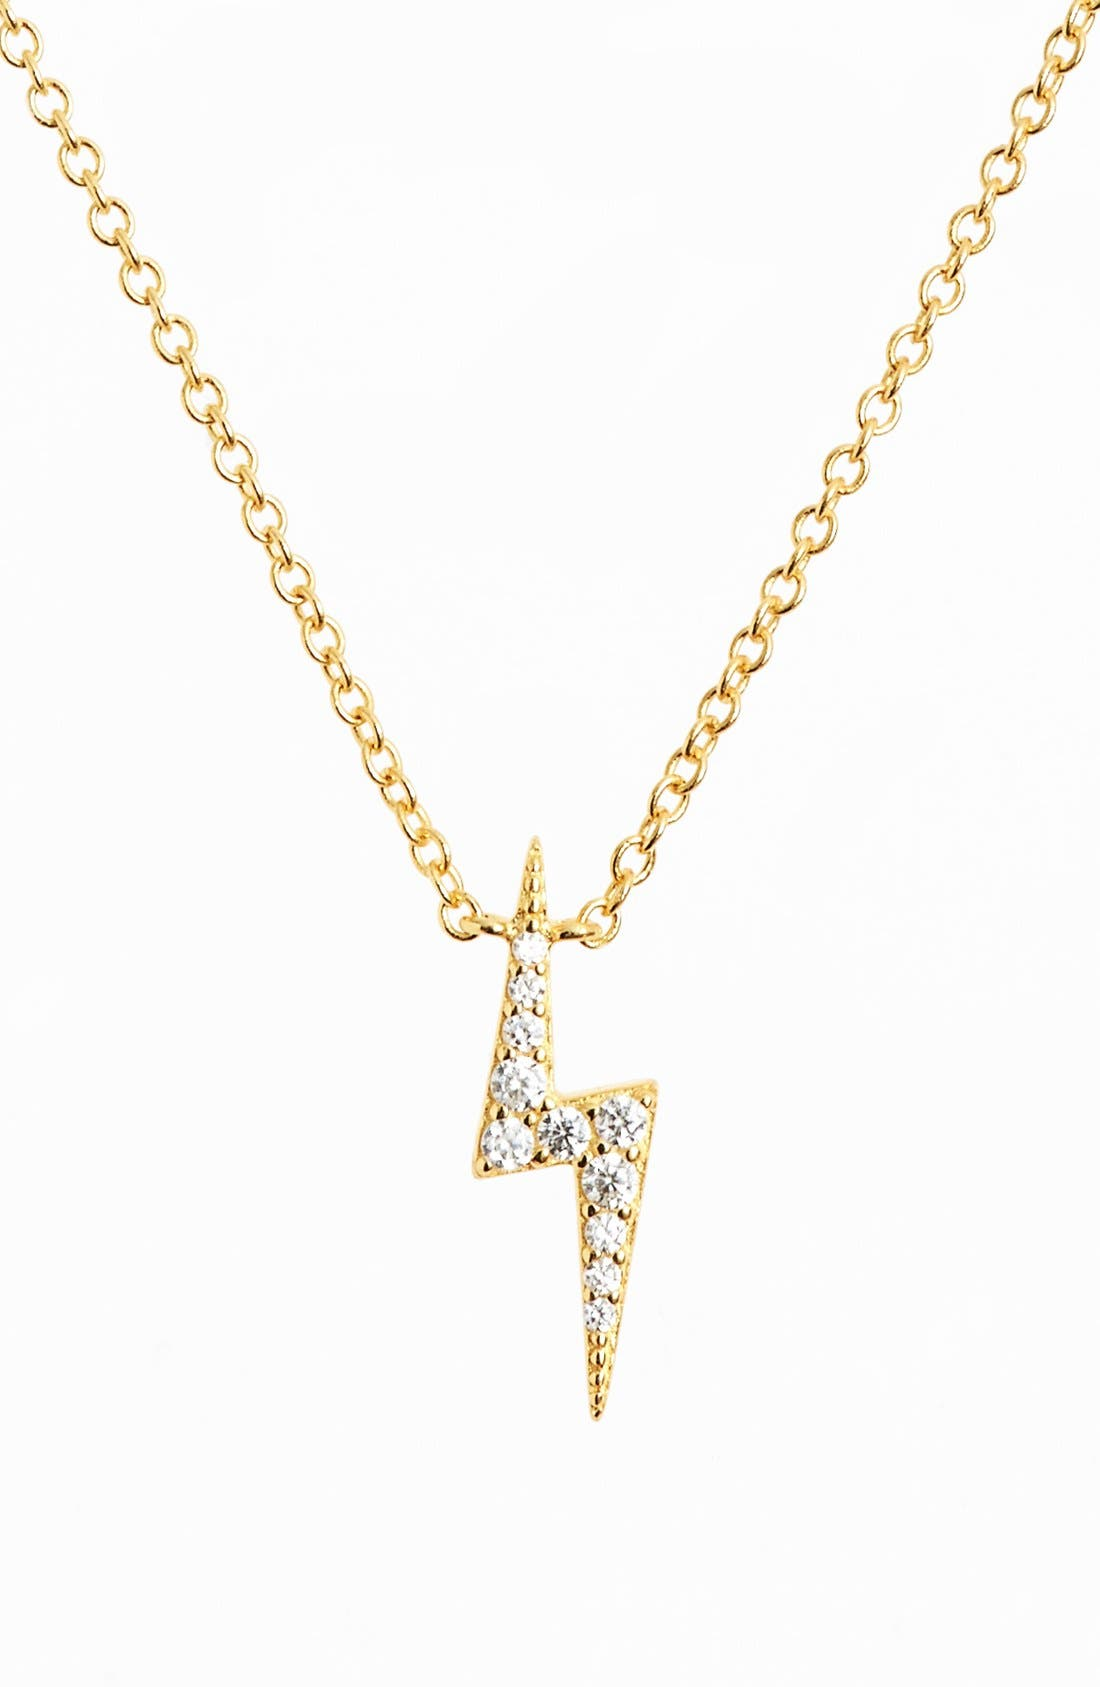 Main Image - Sugar Bean Jewelry Lightning Bolt Pendant Necklace